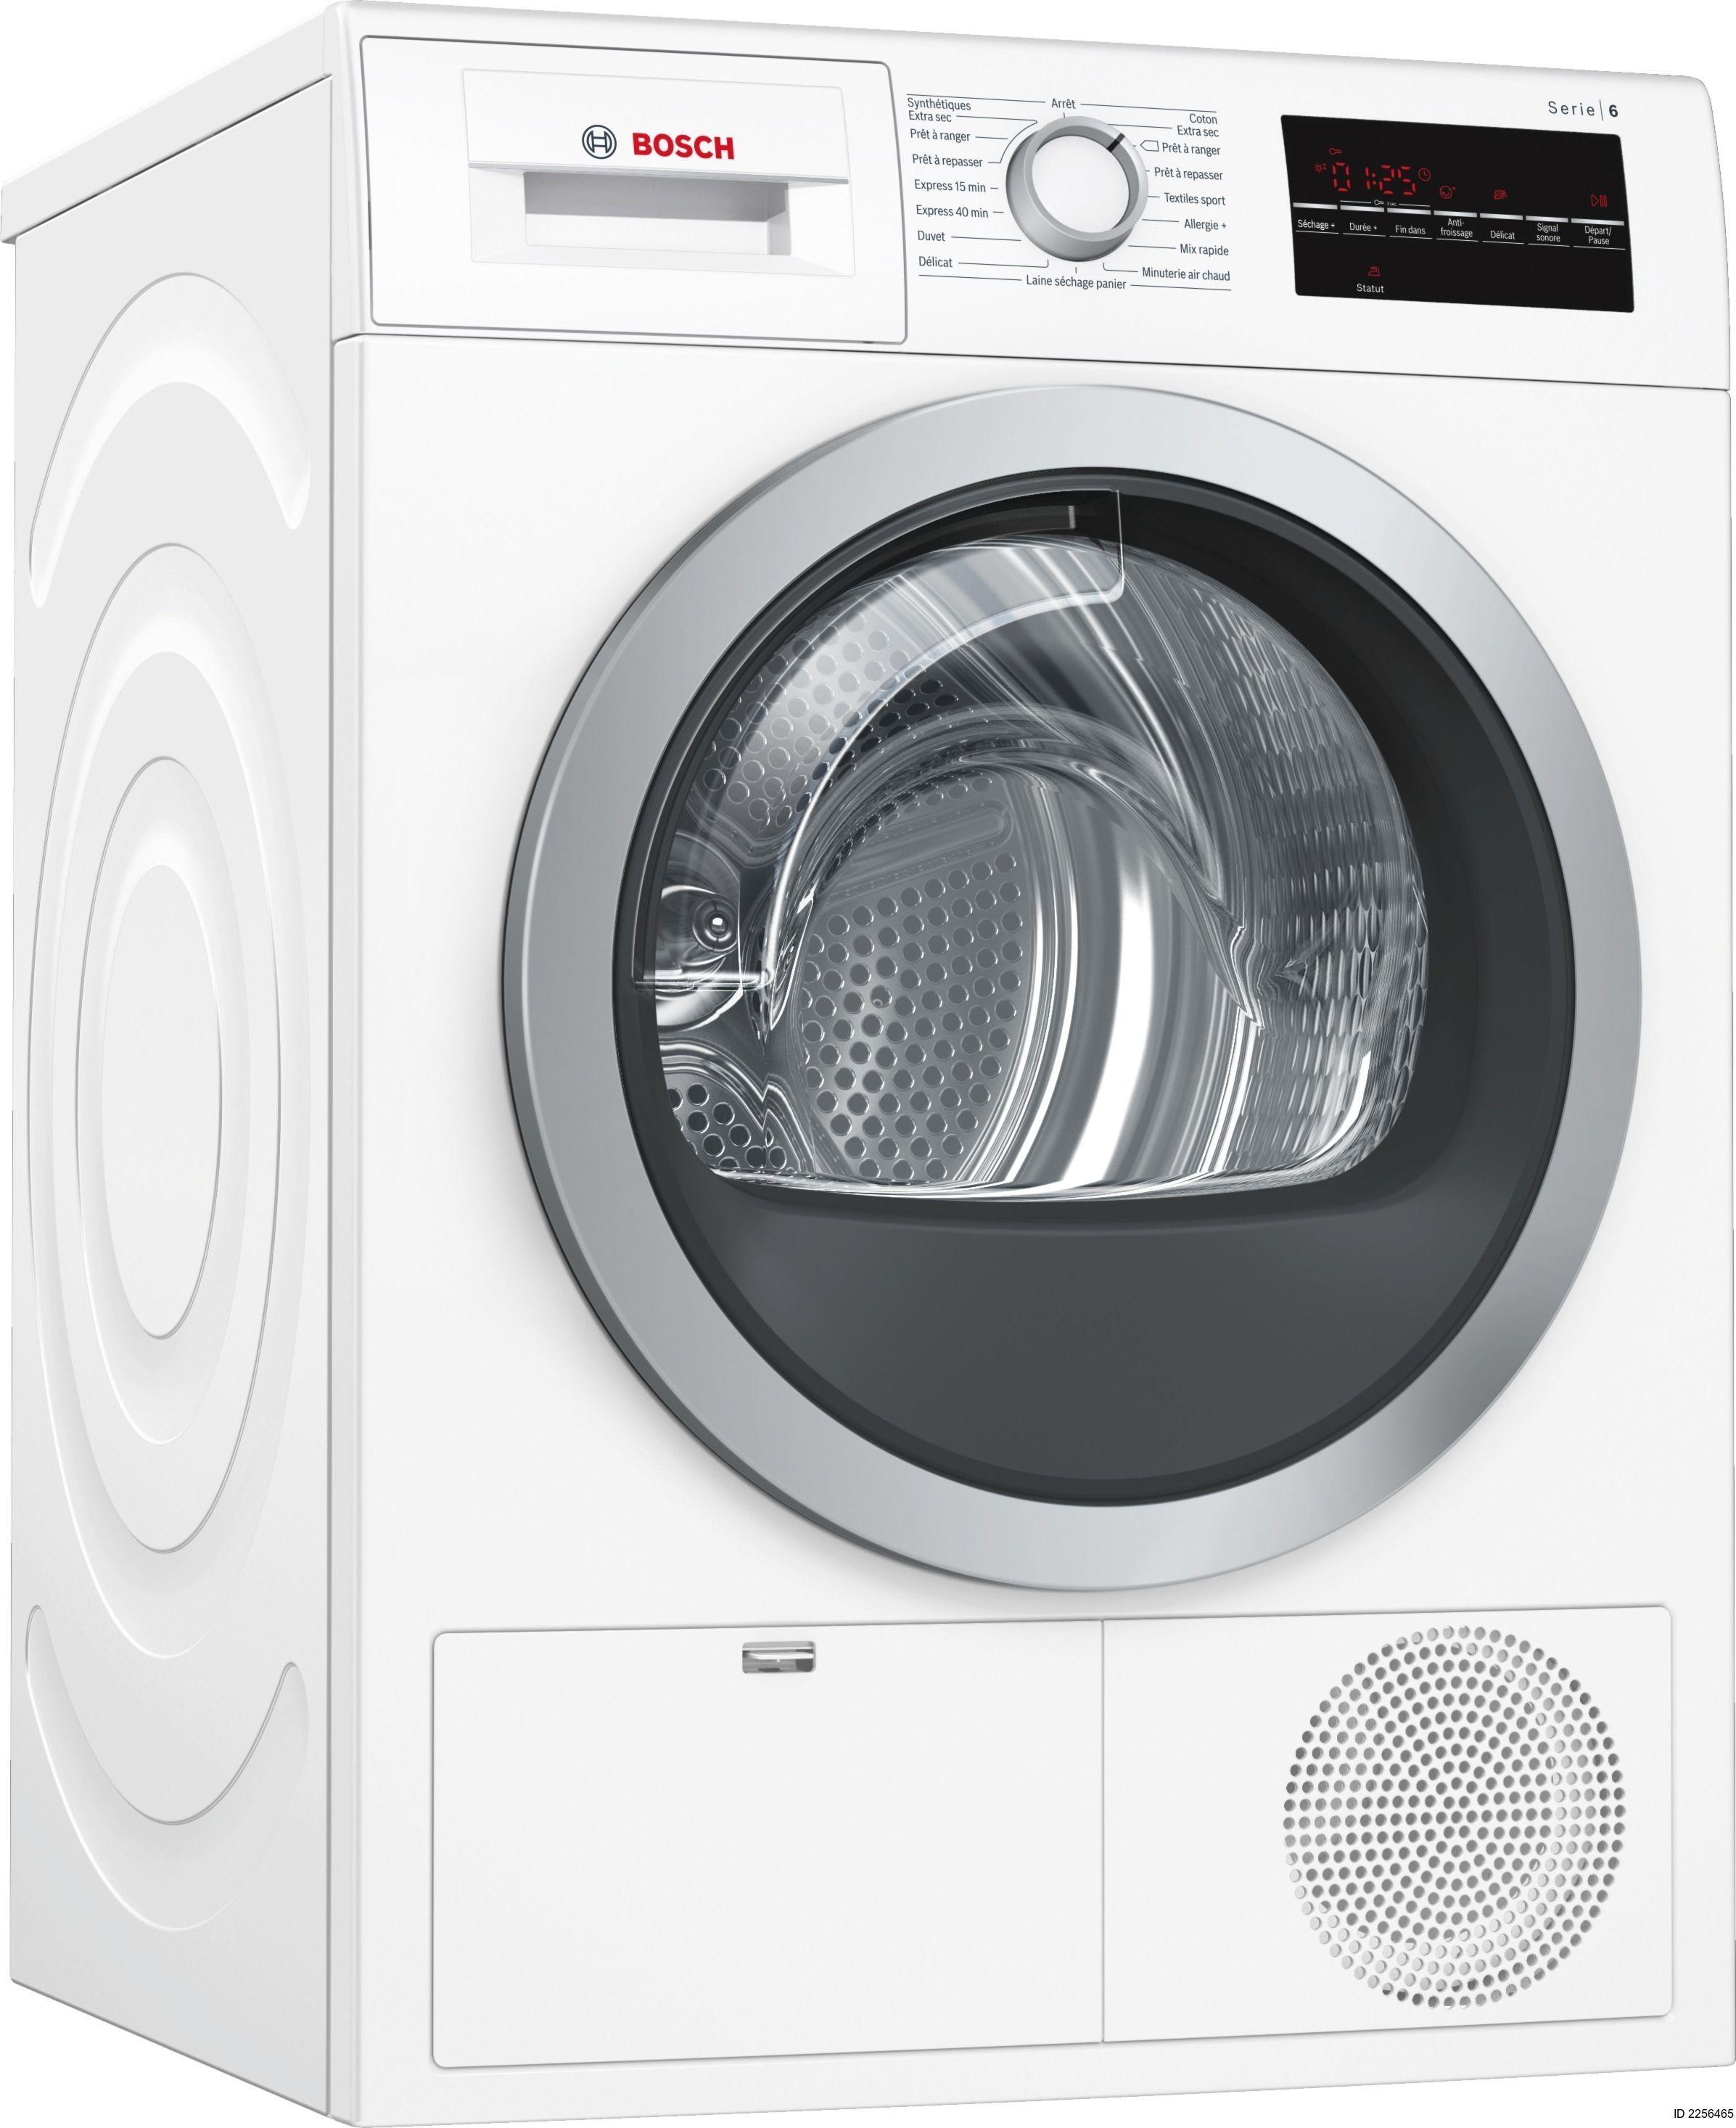 Bosch S Che Linge Condensation Wtg86400ff Achat S Che Linge